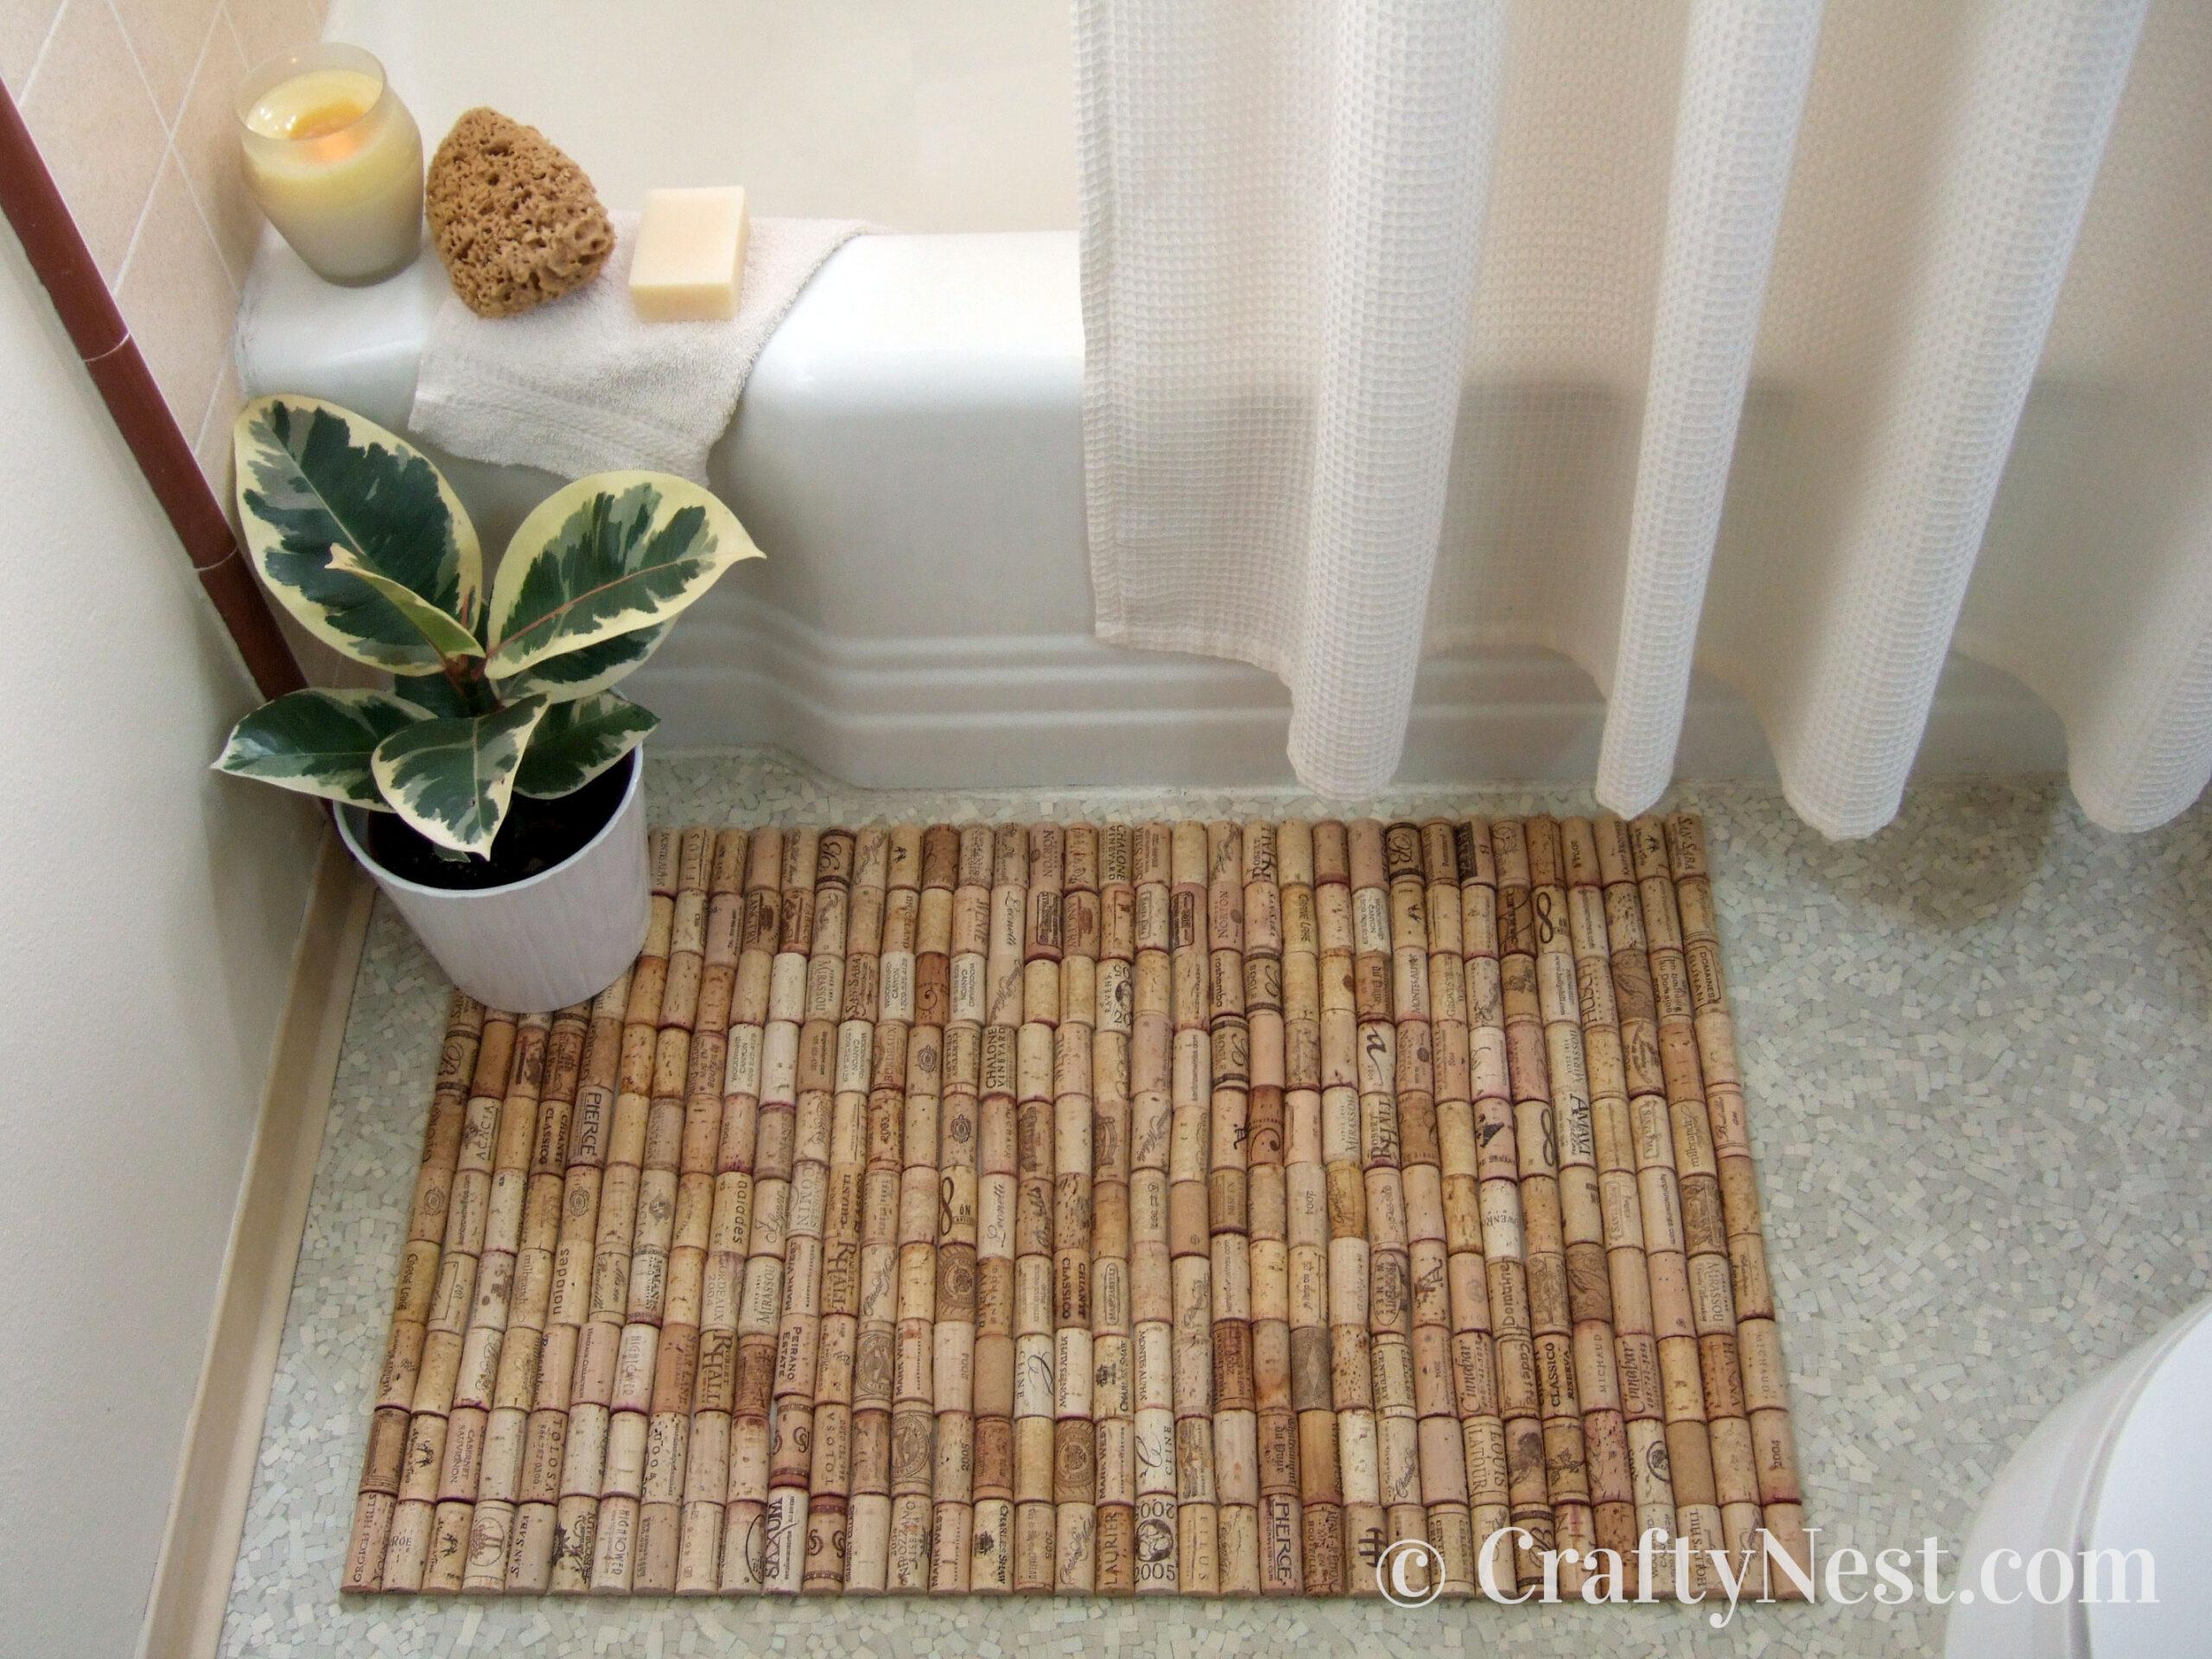 Bath mat made of wine corks, photo